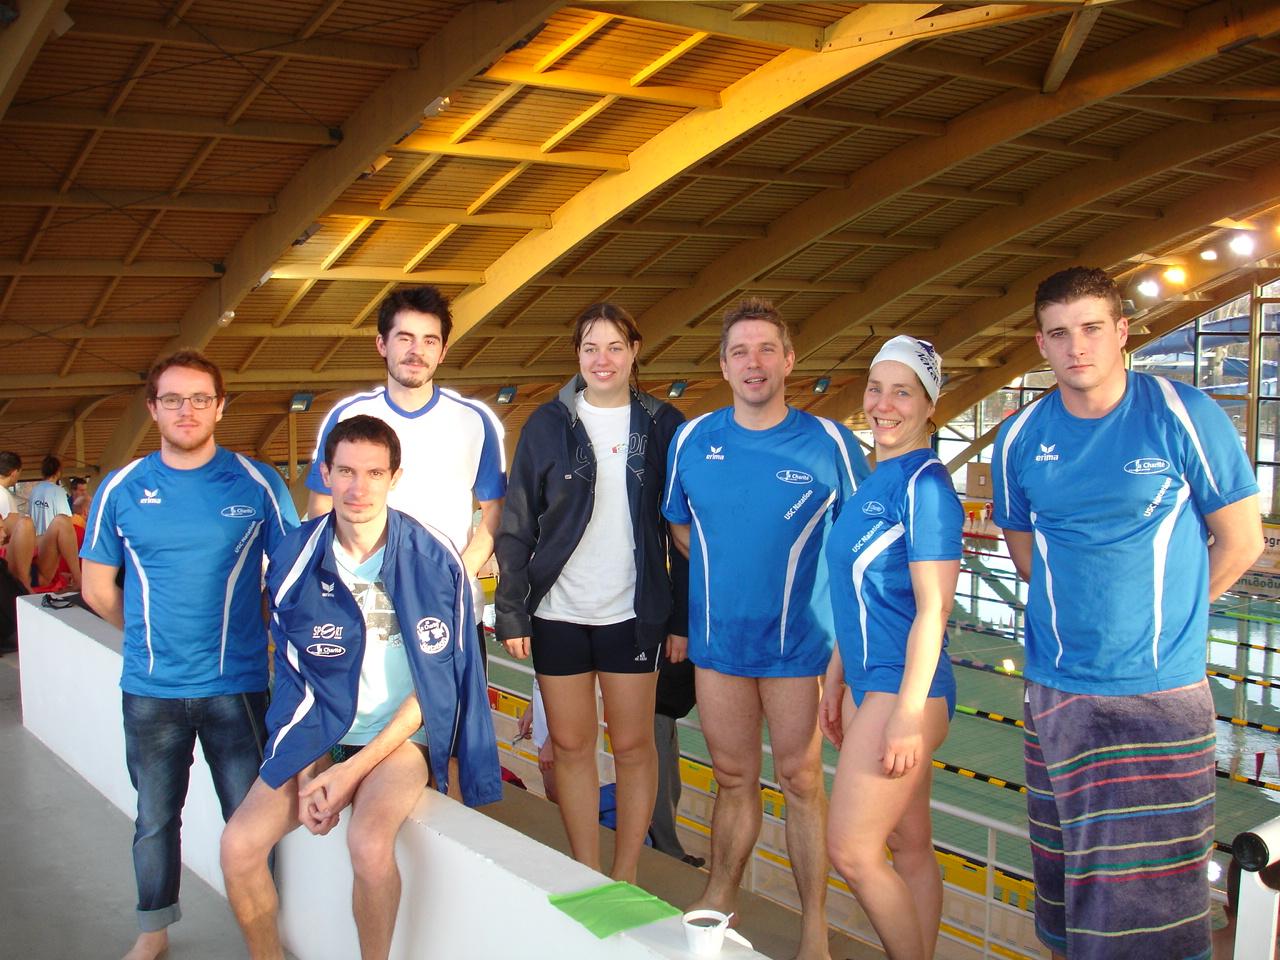 Championnat Bourgogne Auxerre 2013